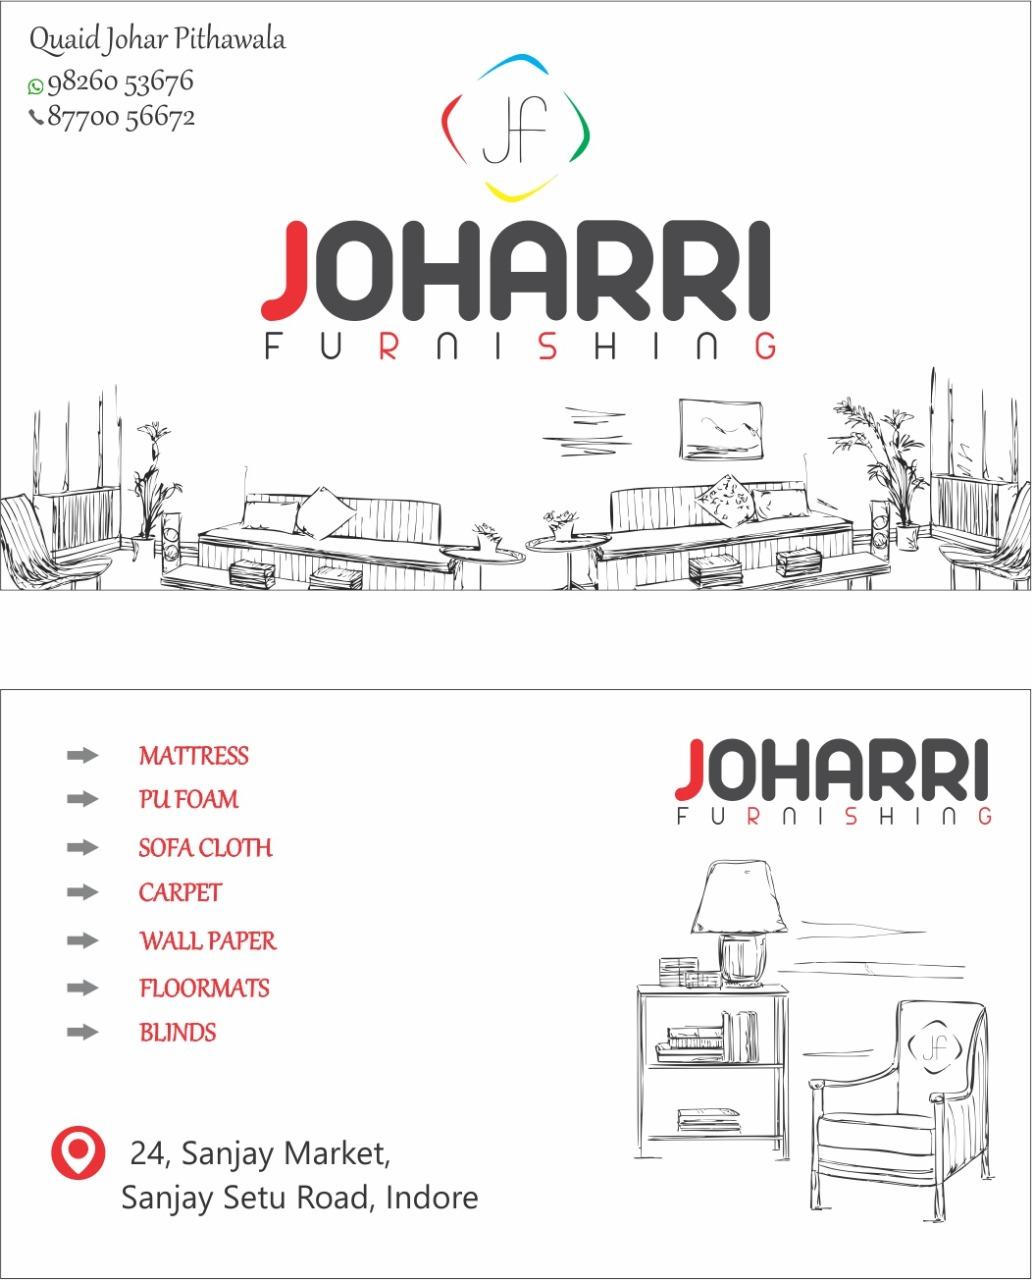 Joharri furnishing